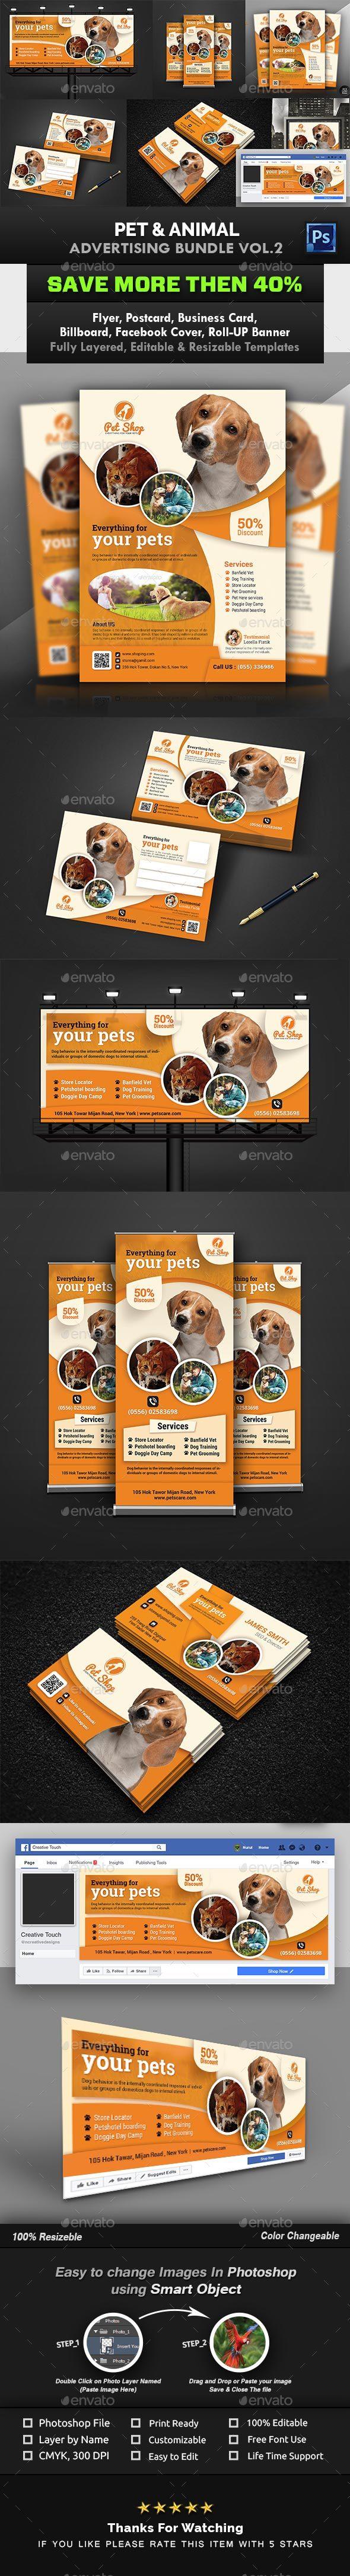 GraphicRiver Pet & Animal Advertising Bundle Vol.2 21054998